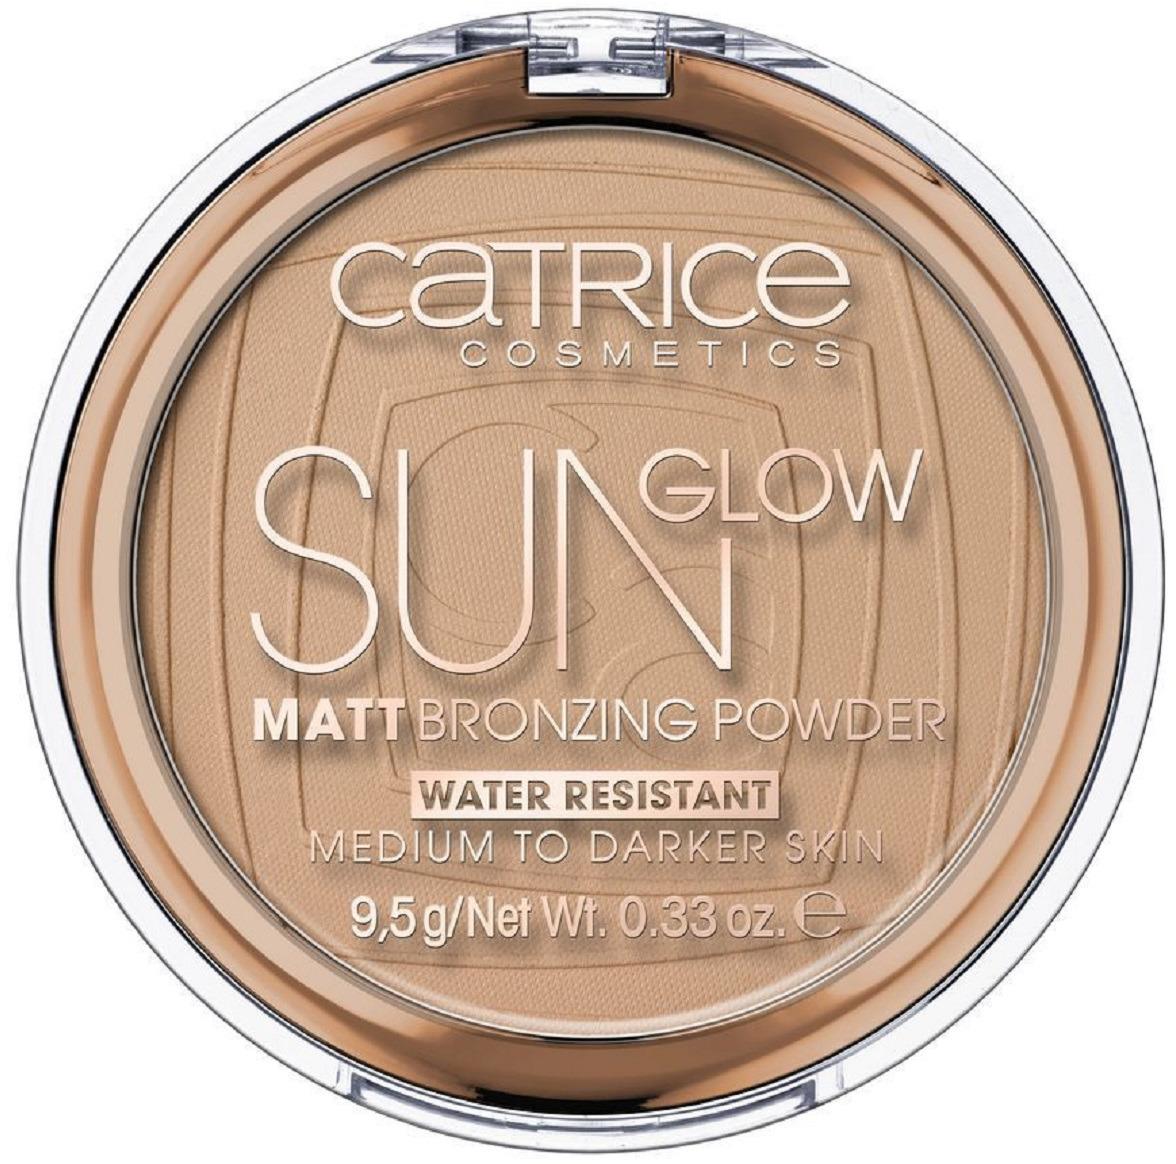 Пудра компактная CatriceSunGlowMattBronzingPower, с эффектом загара, матирующая, оттенок 035 Universal Bronze, 9,5 г бронзирующая пудра sun glow matt bronzing powder catrice лицо